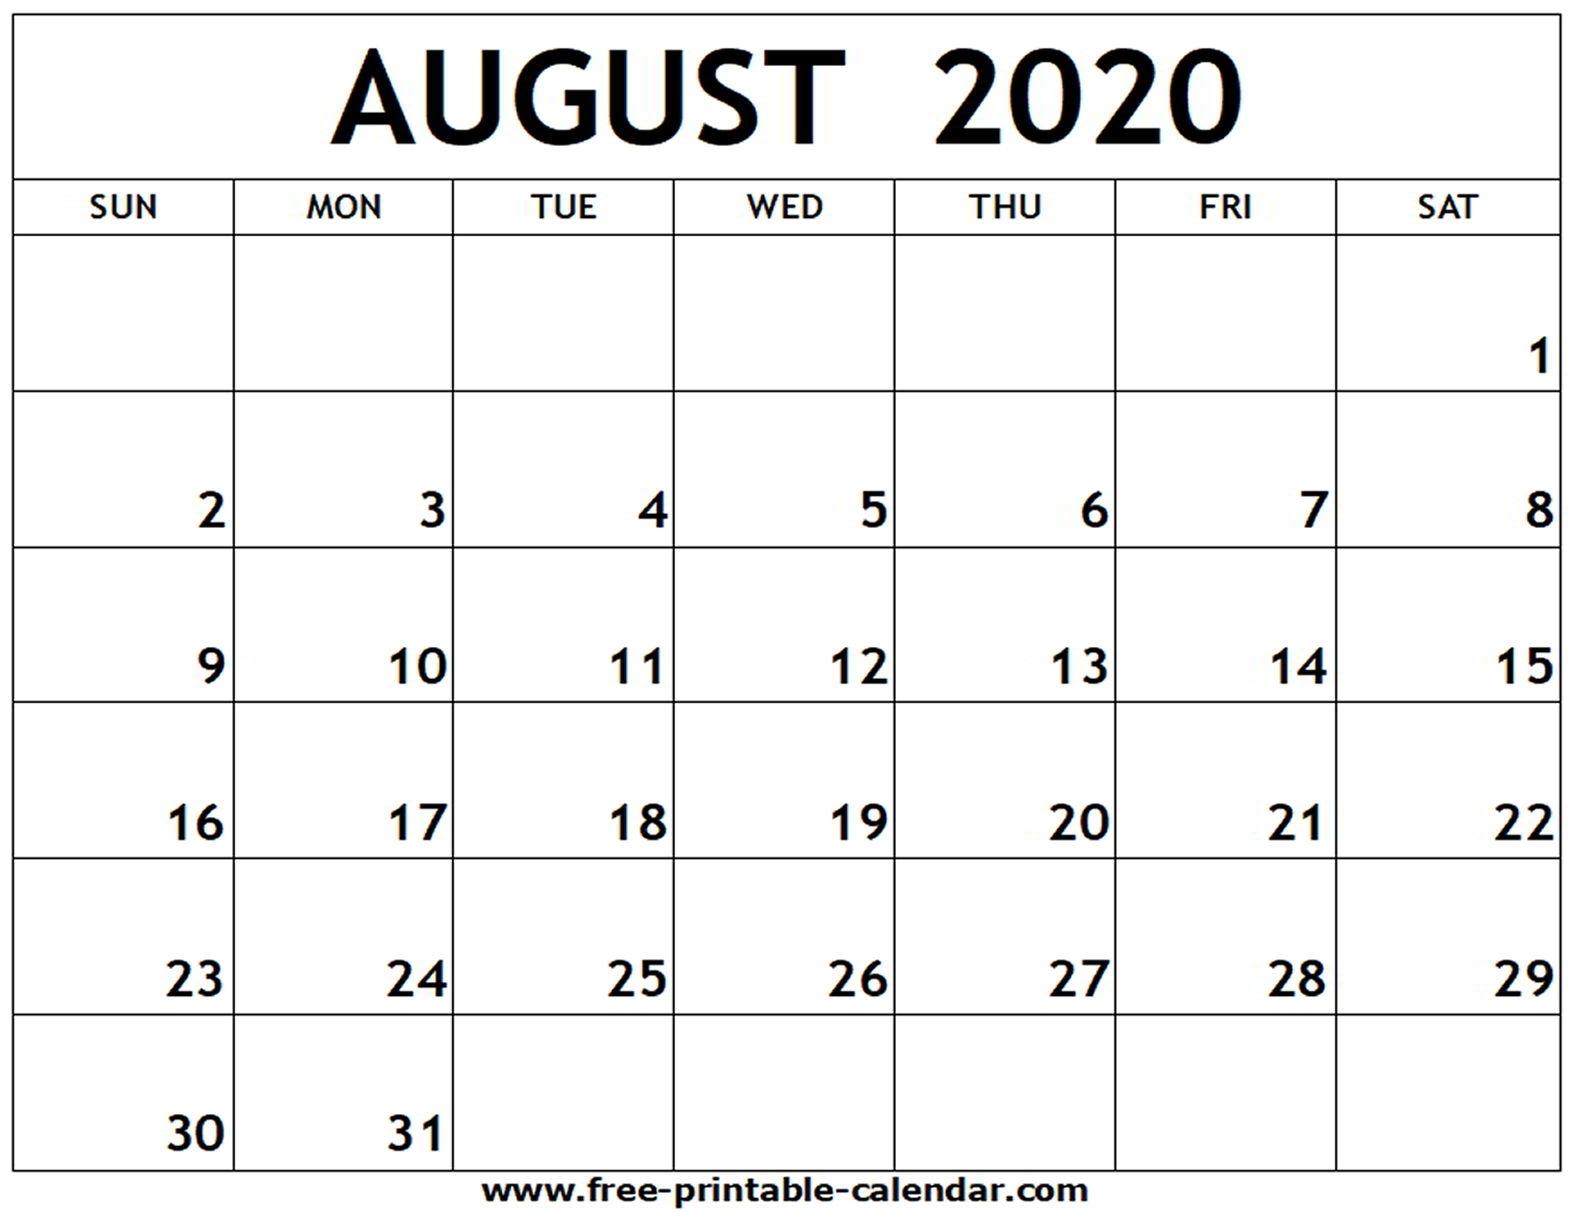 August 2020 Printable Calendar - Free-Printable-Calendar